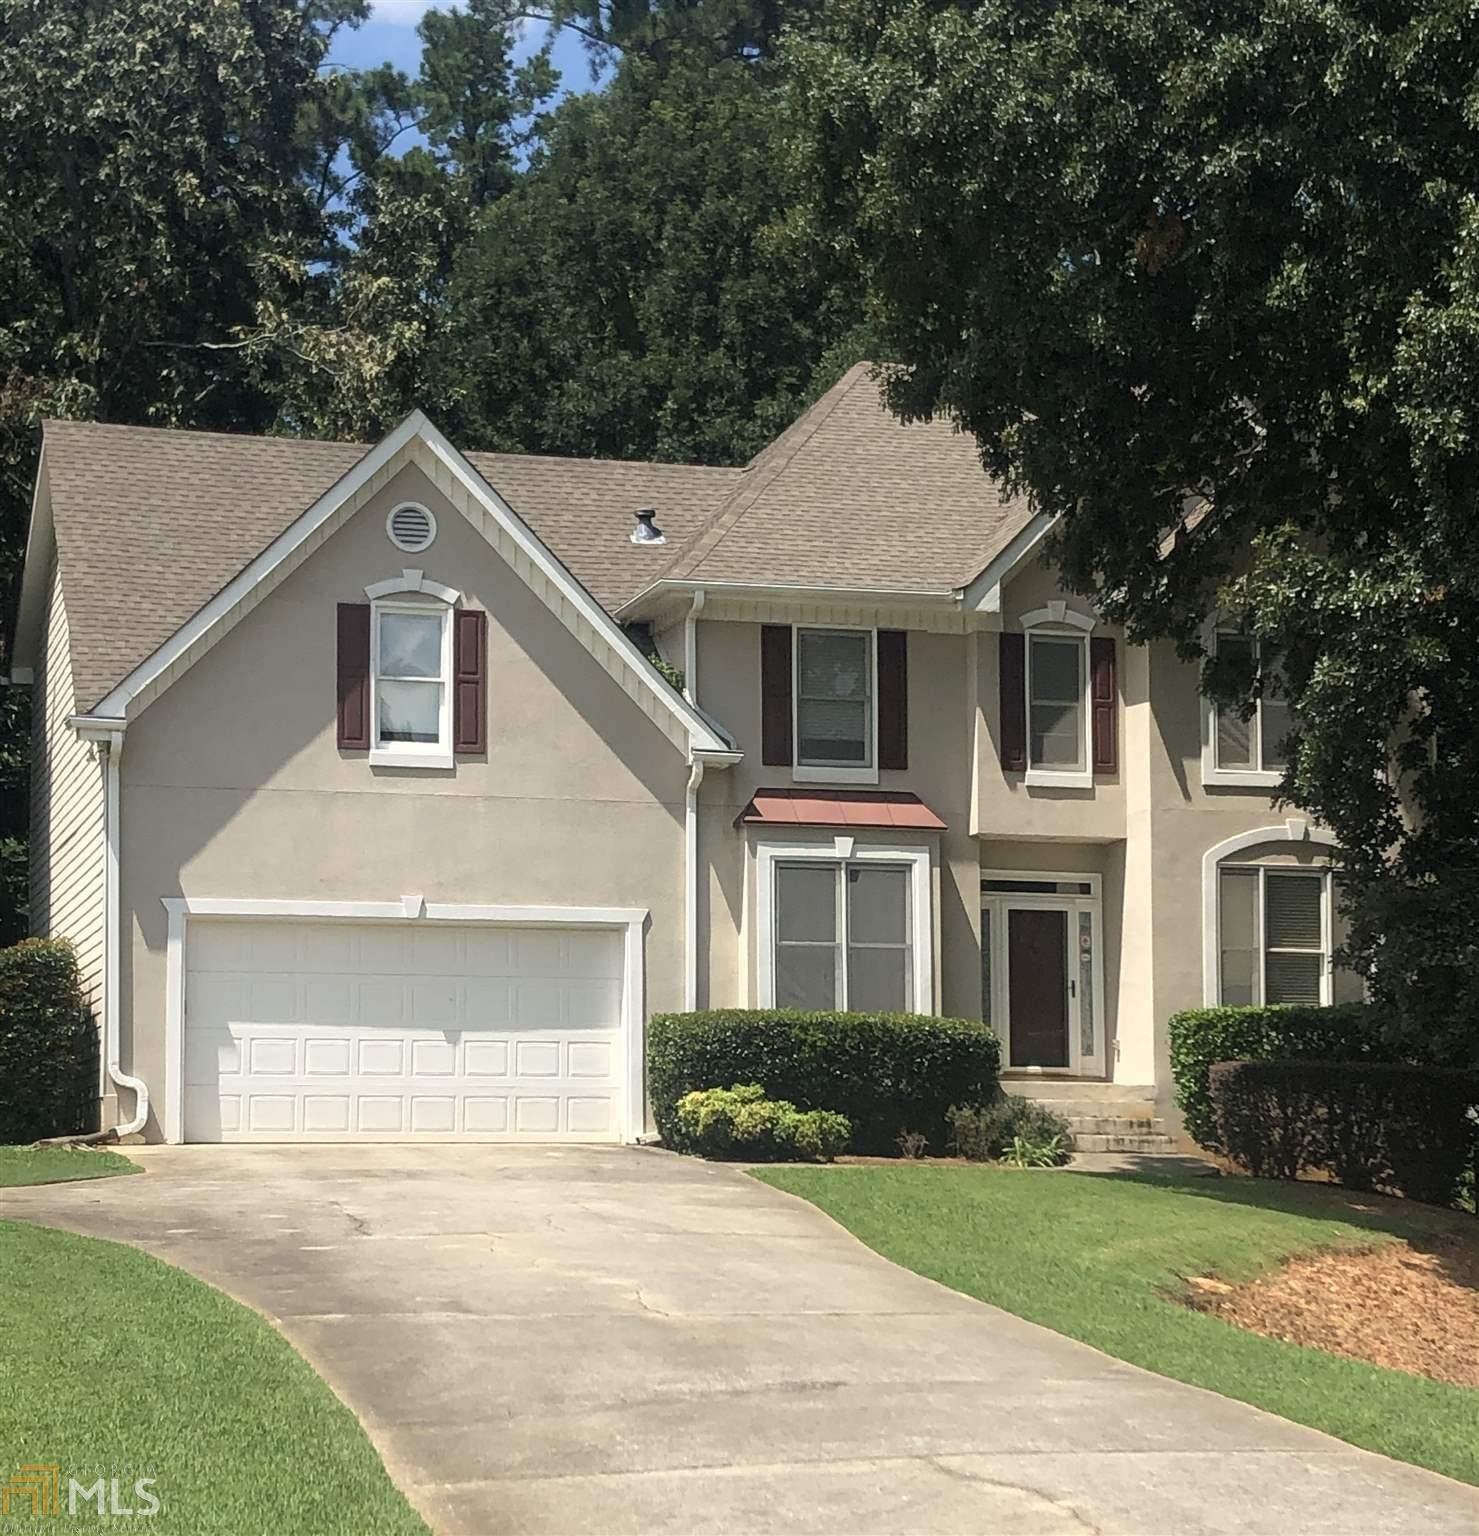 217 Whitestone, Canton, GA 30115 - MLS#: 8845305